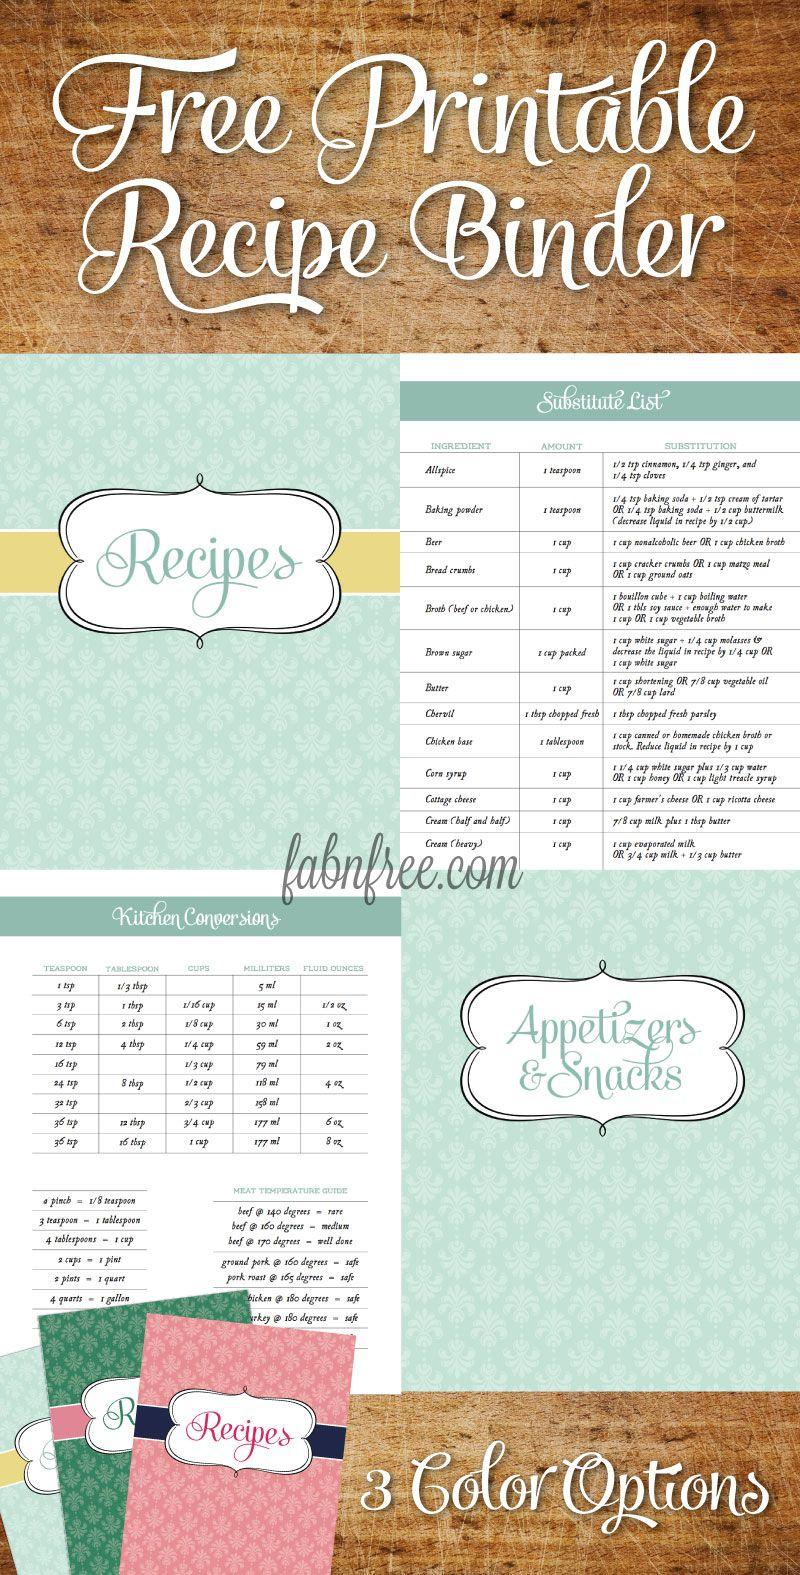 Free Recipe Binder In 3 Color Options | Recipe Binder Ideas - Free Printable Cookbooks Pdf